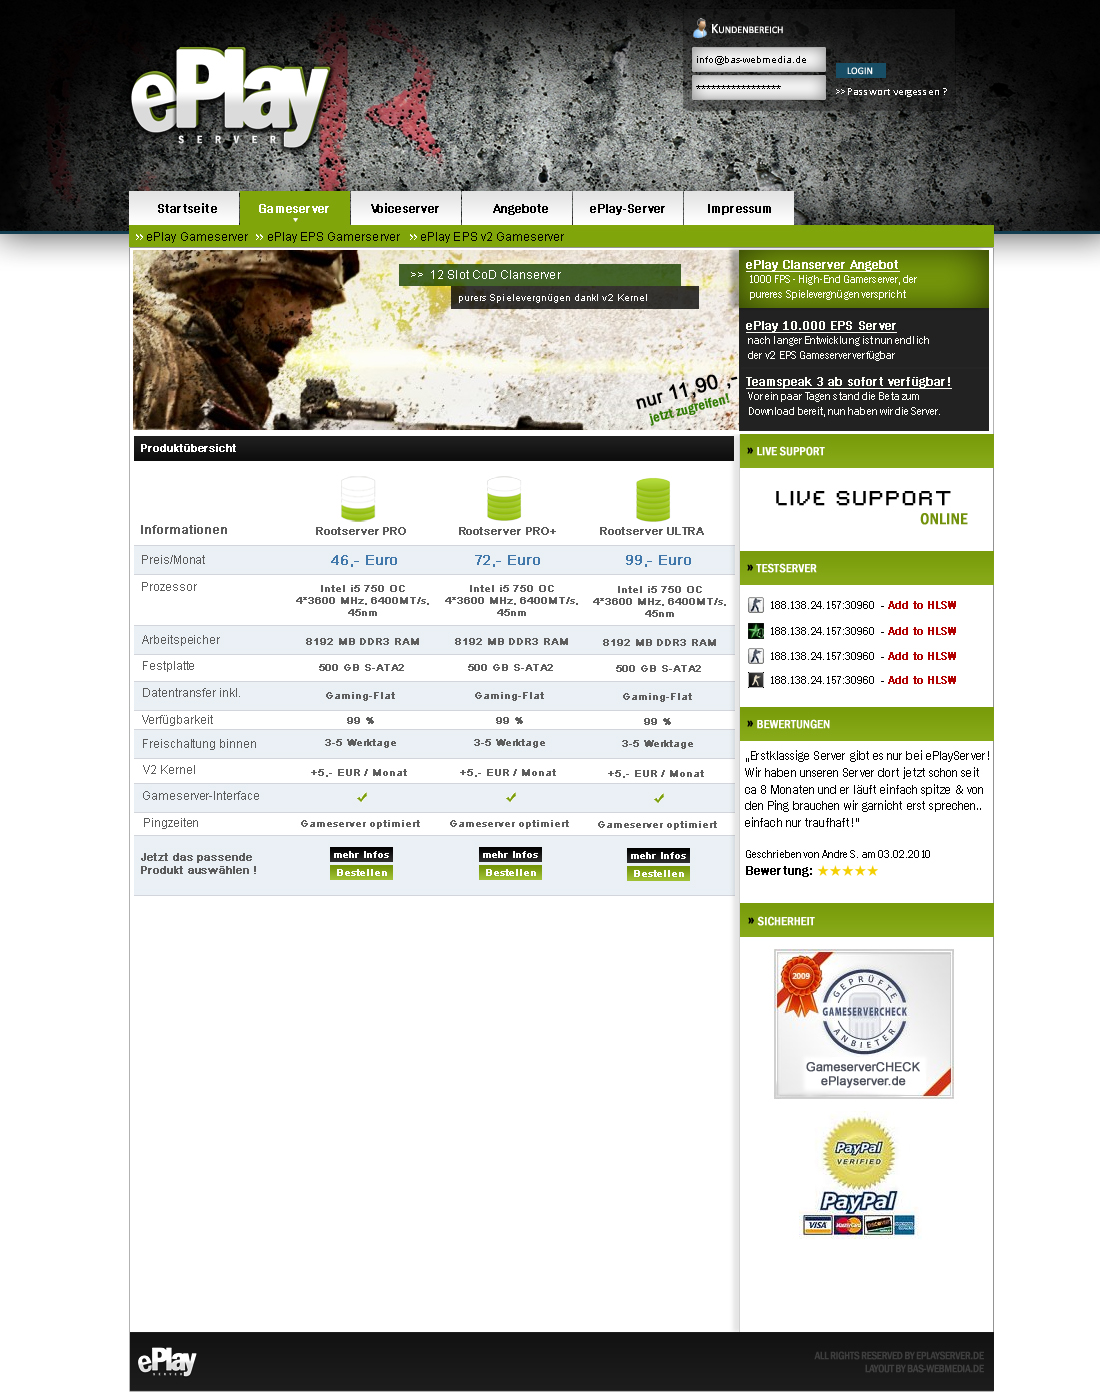 Icq Chat German >> ePlay-Server Hosting Design by BAS-design on DeviantArt